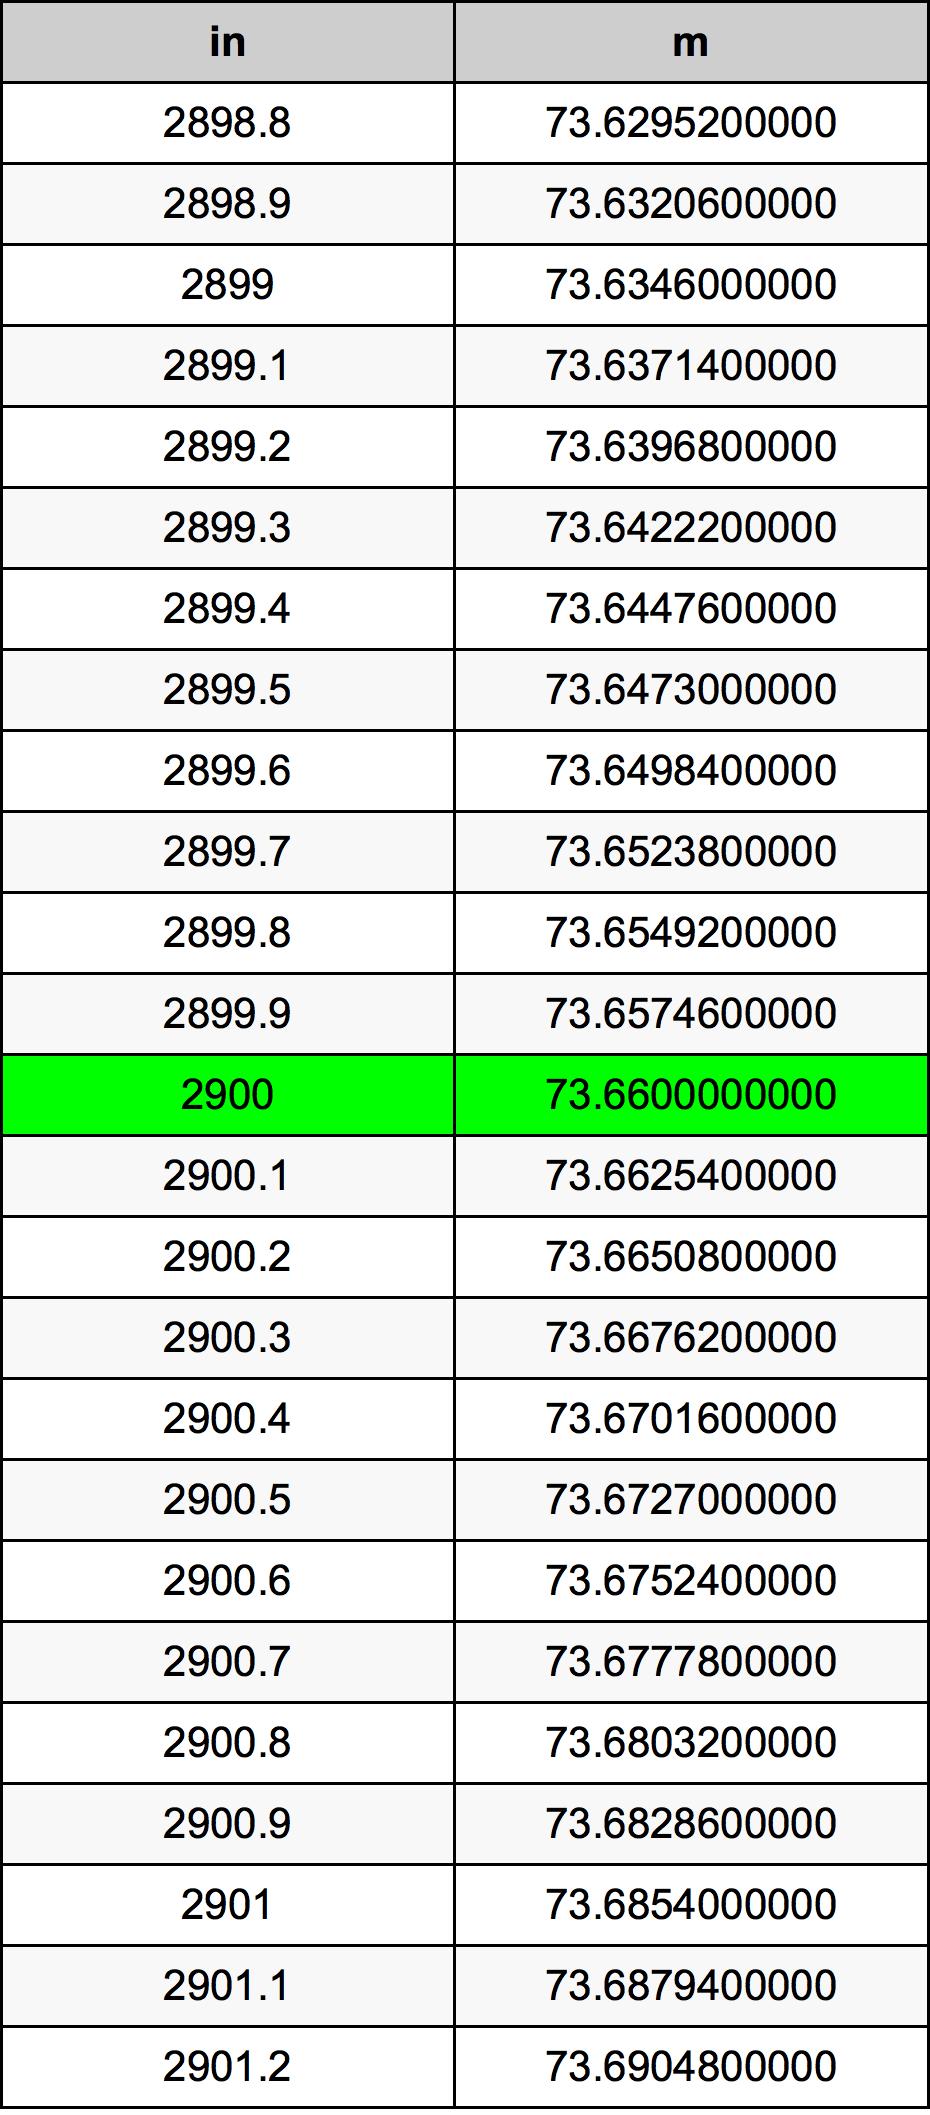 2900 Inch konverteringstabell